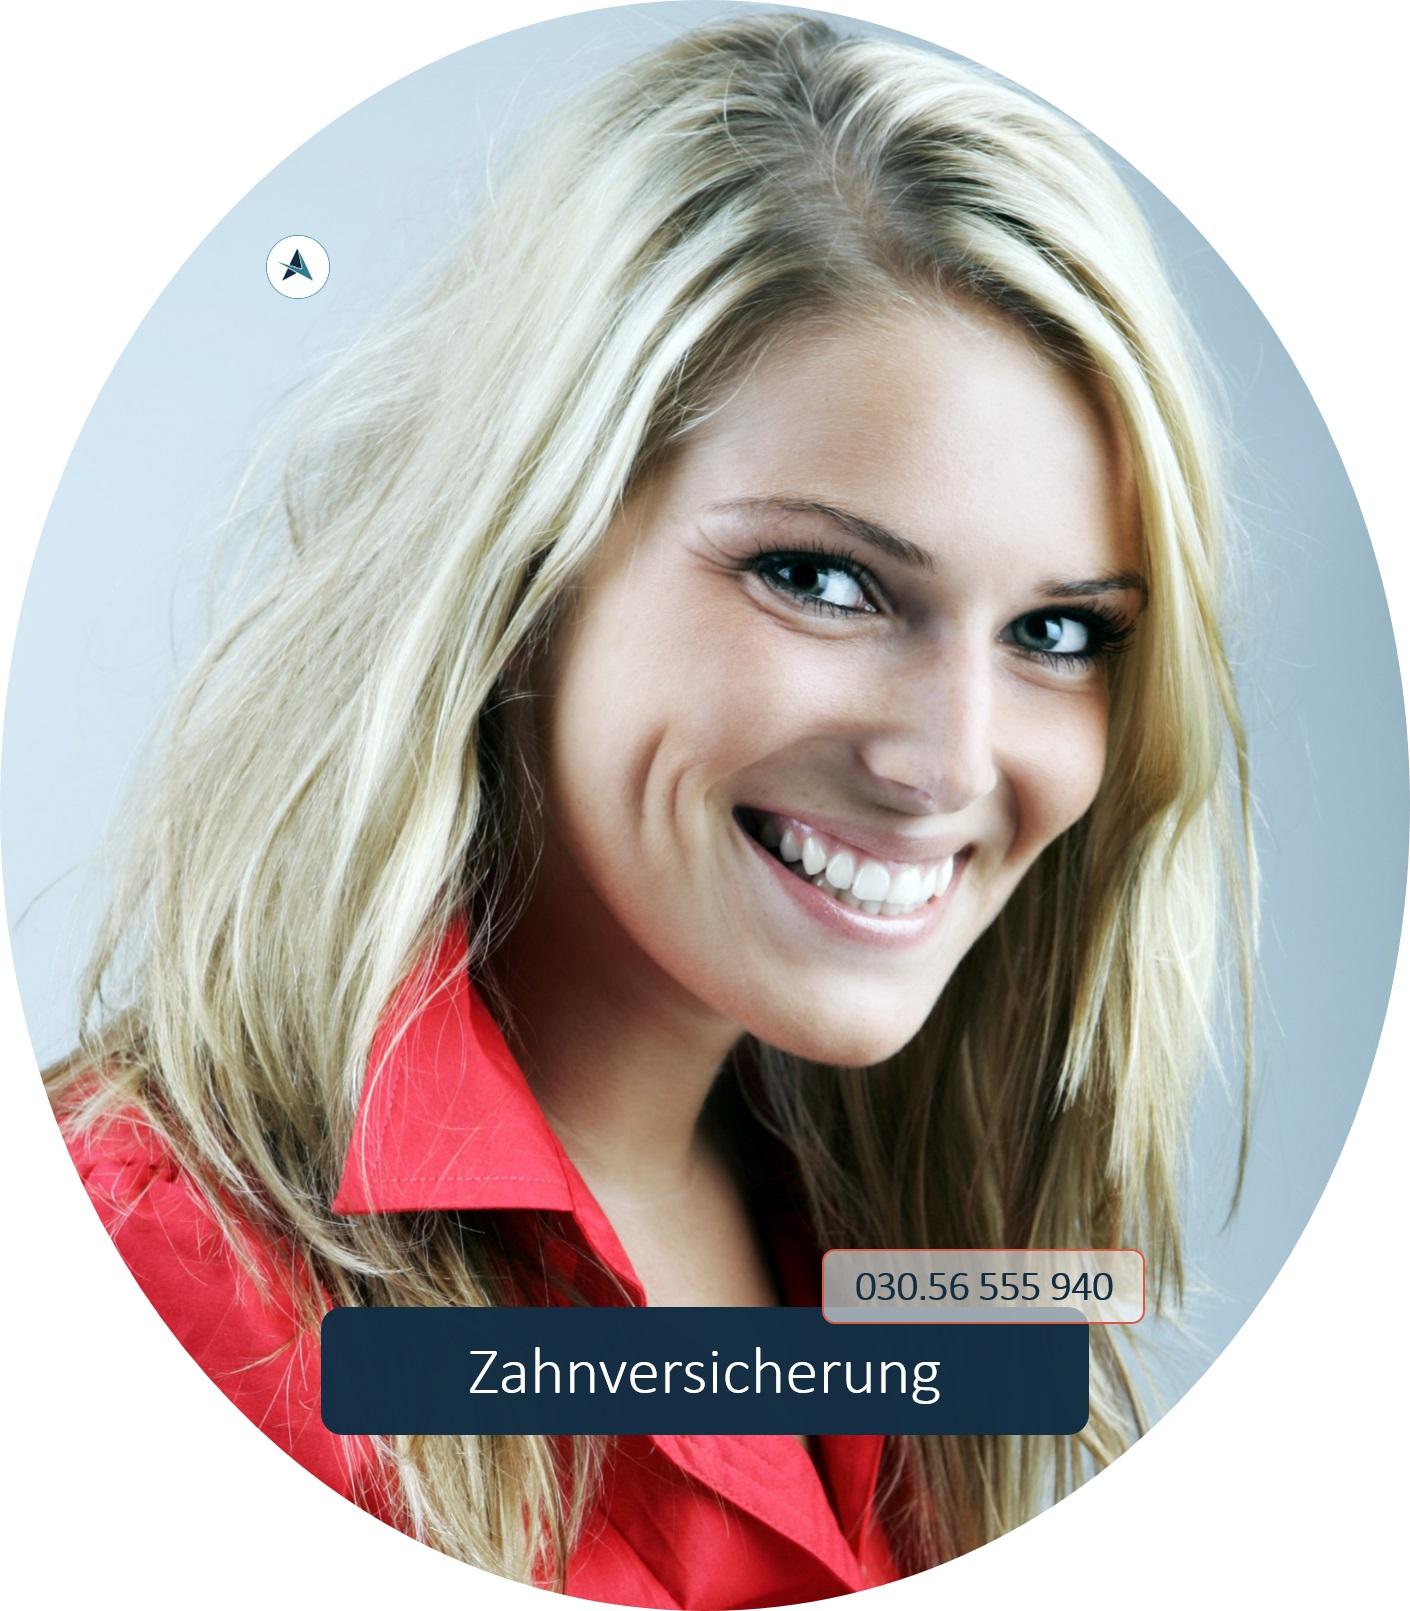 Zahnversicherung-Berlin-Zahnzusatzversicherung-Berlin-Versicherungsmakler-Berlin-Andre-Boettcher